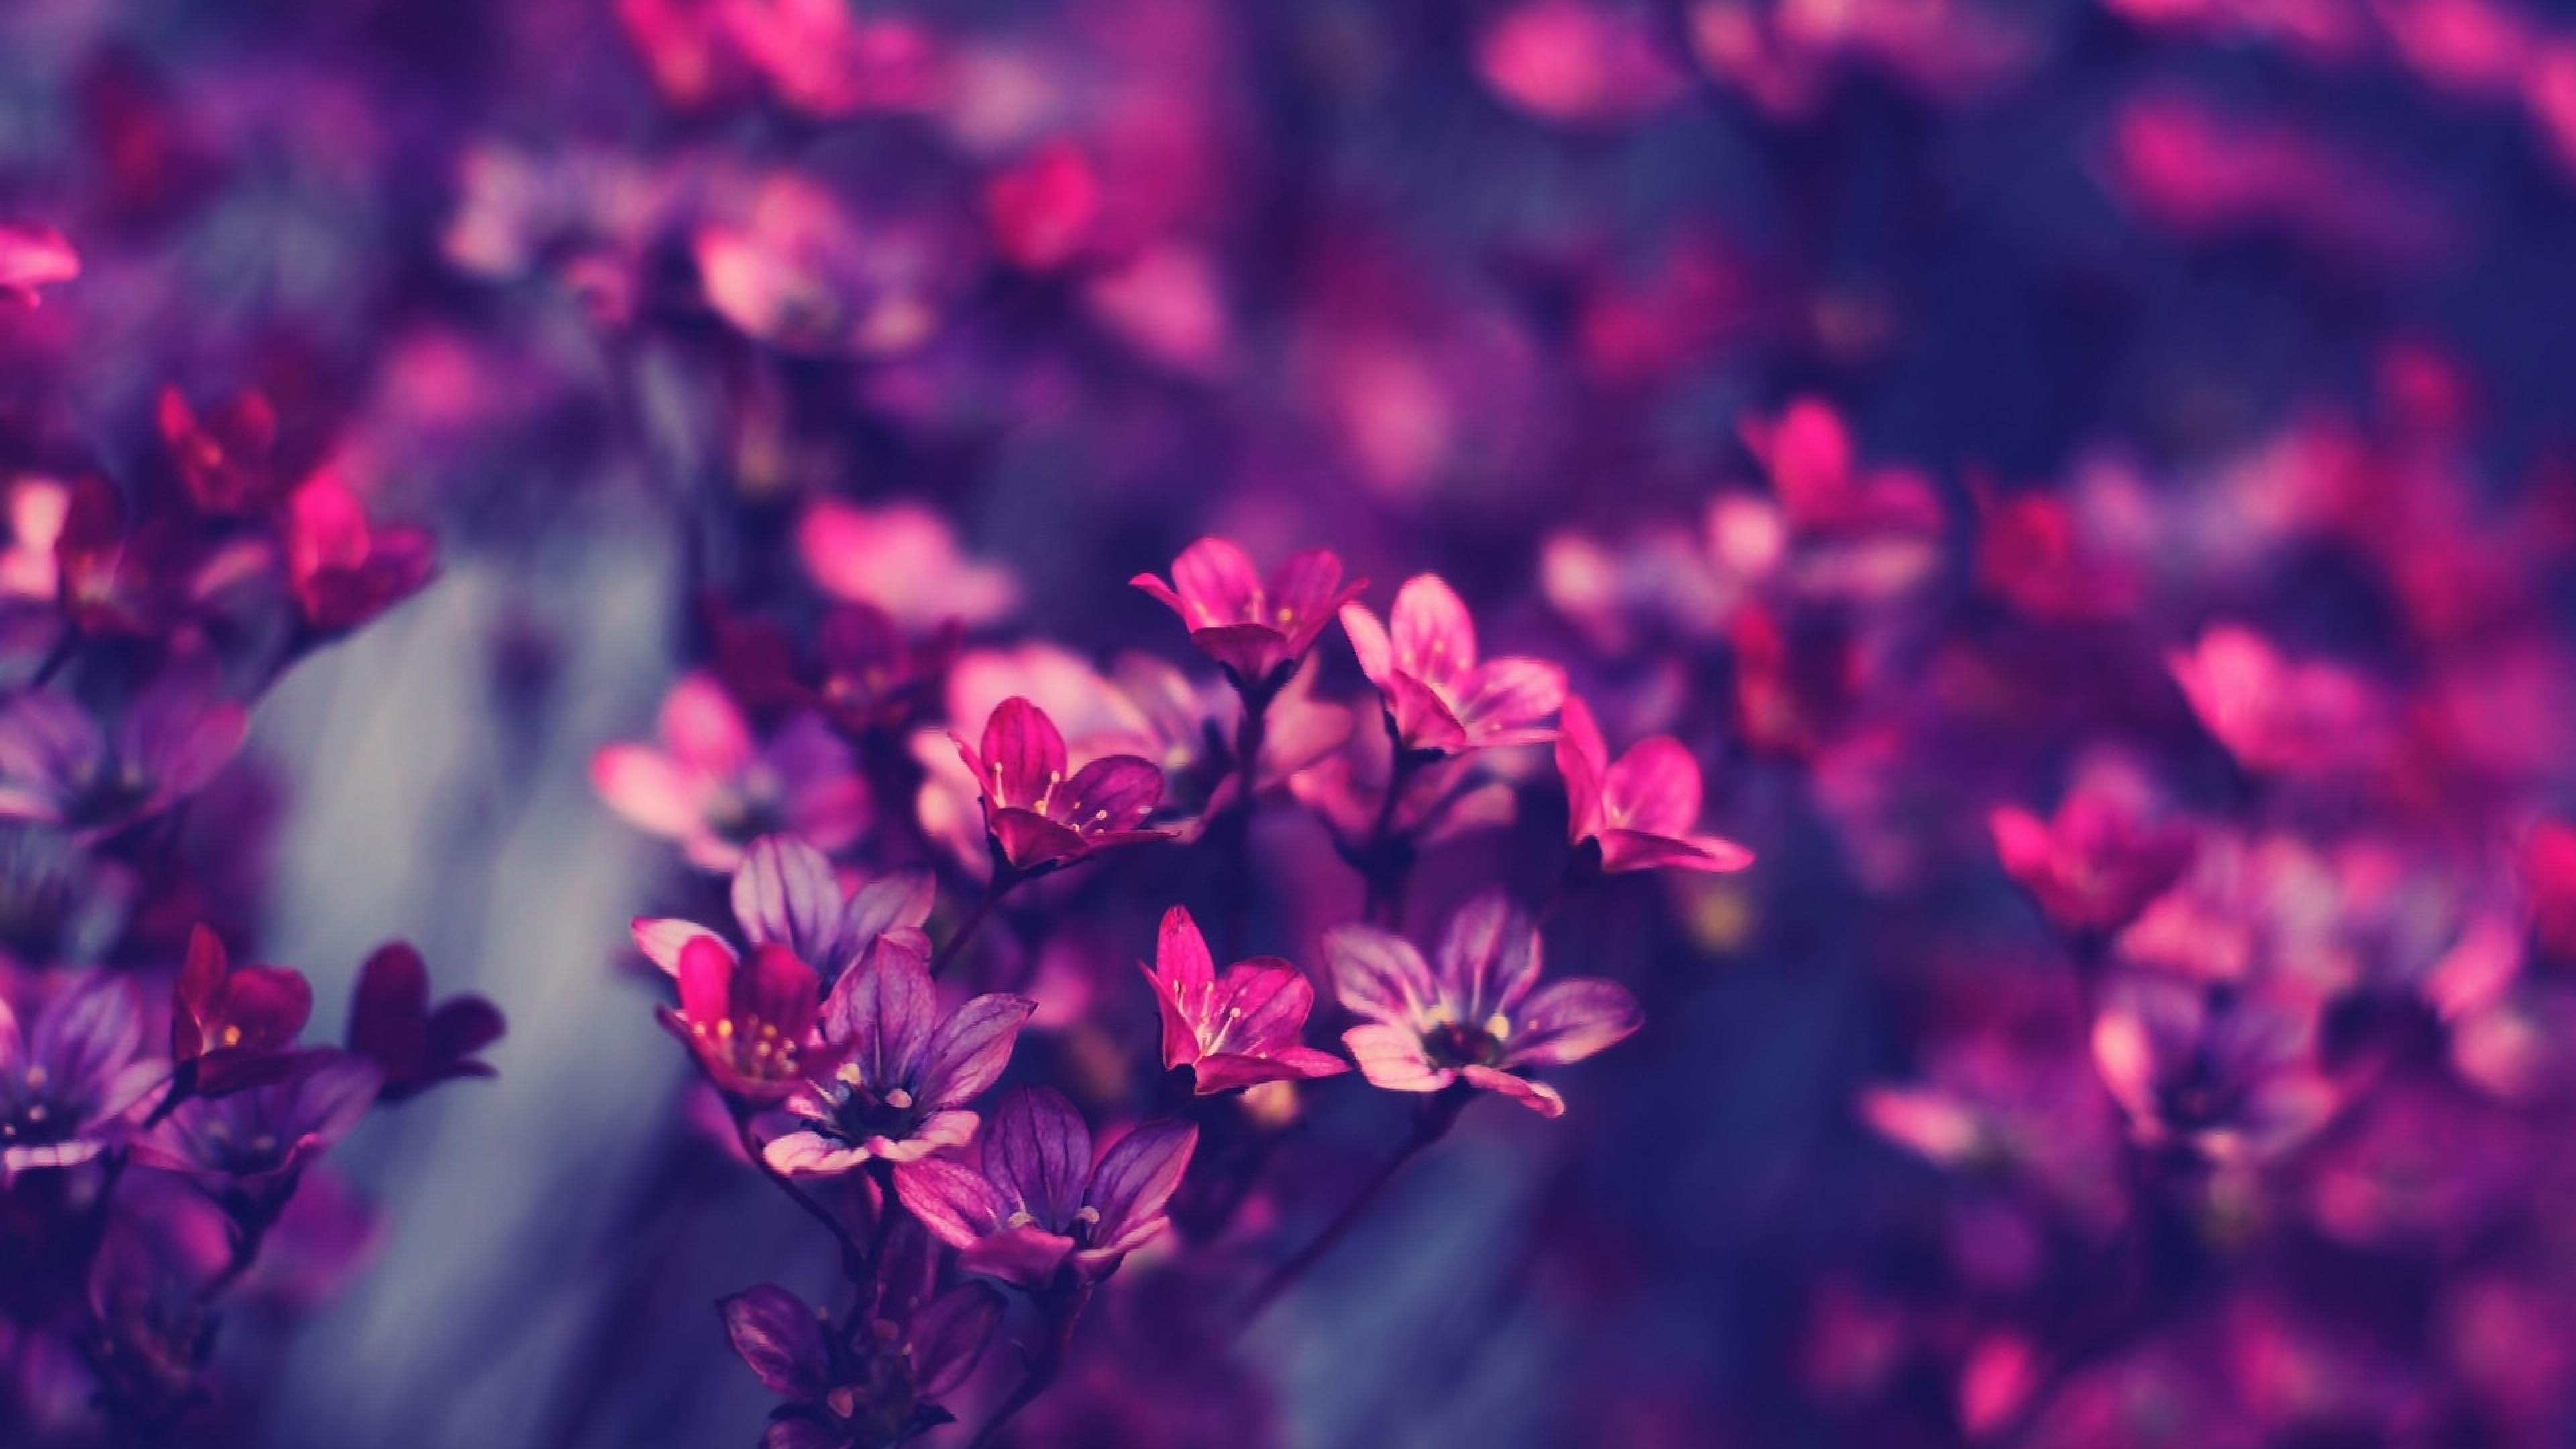 Tumblr Pink Flower Wallpaper Football Free Hd Wallpaper